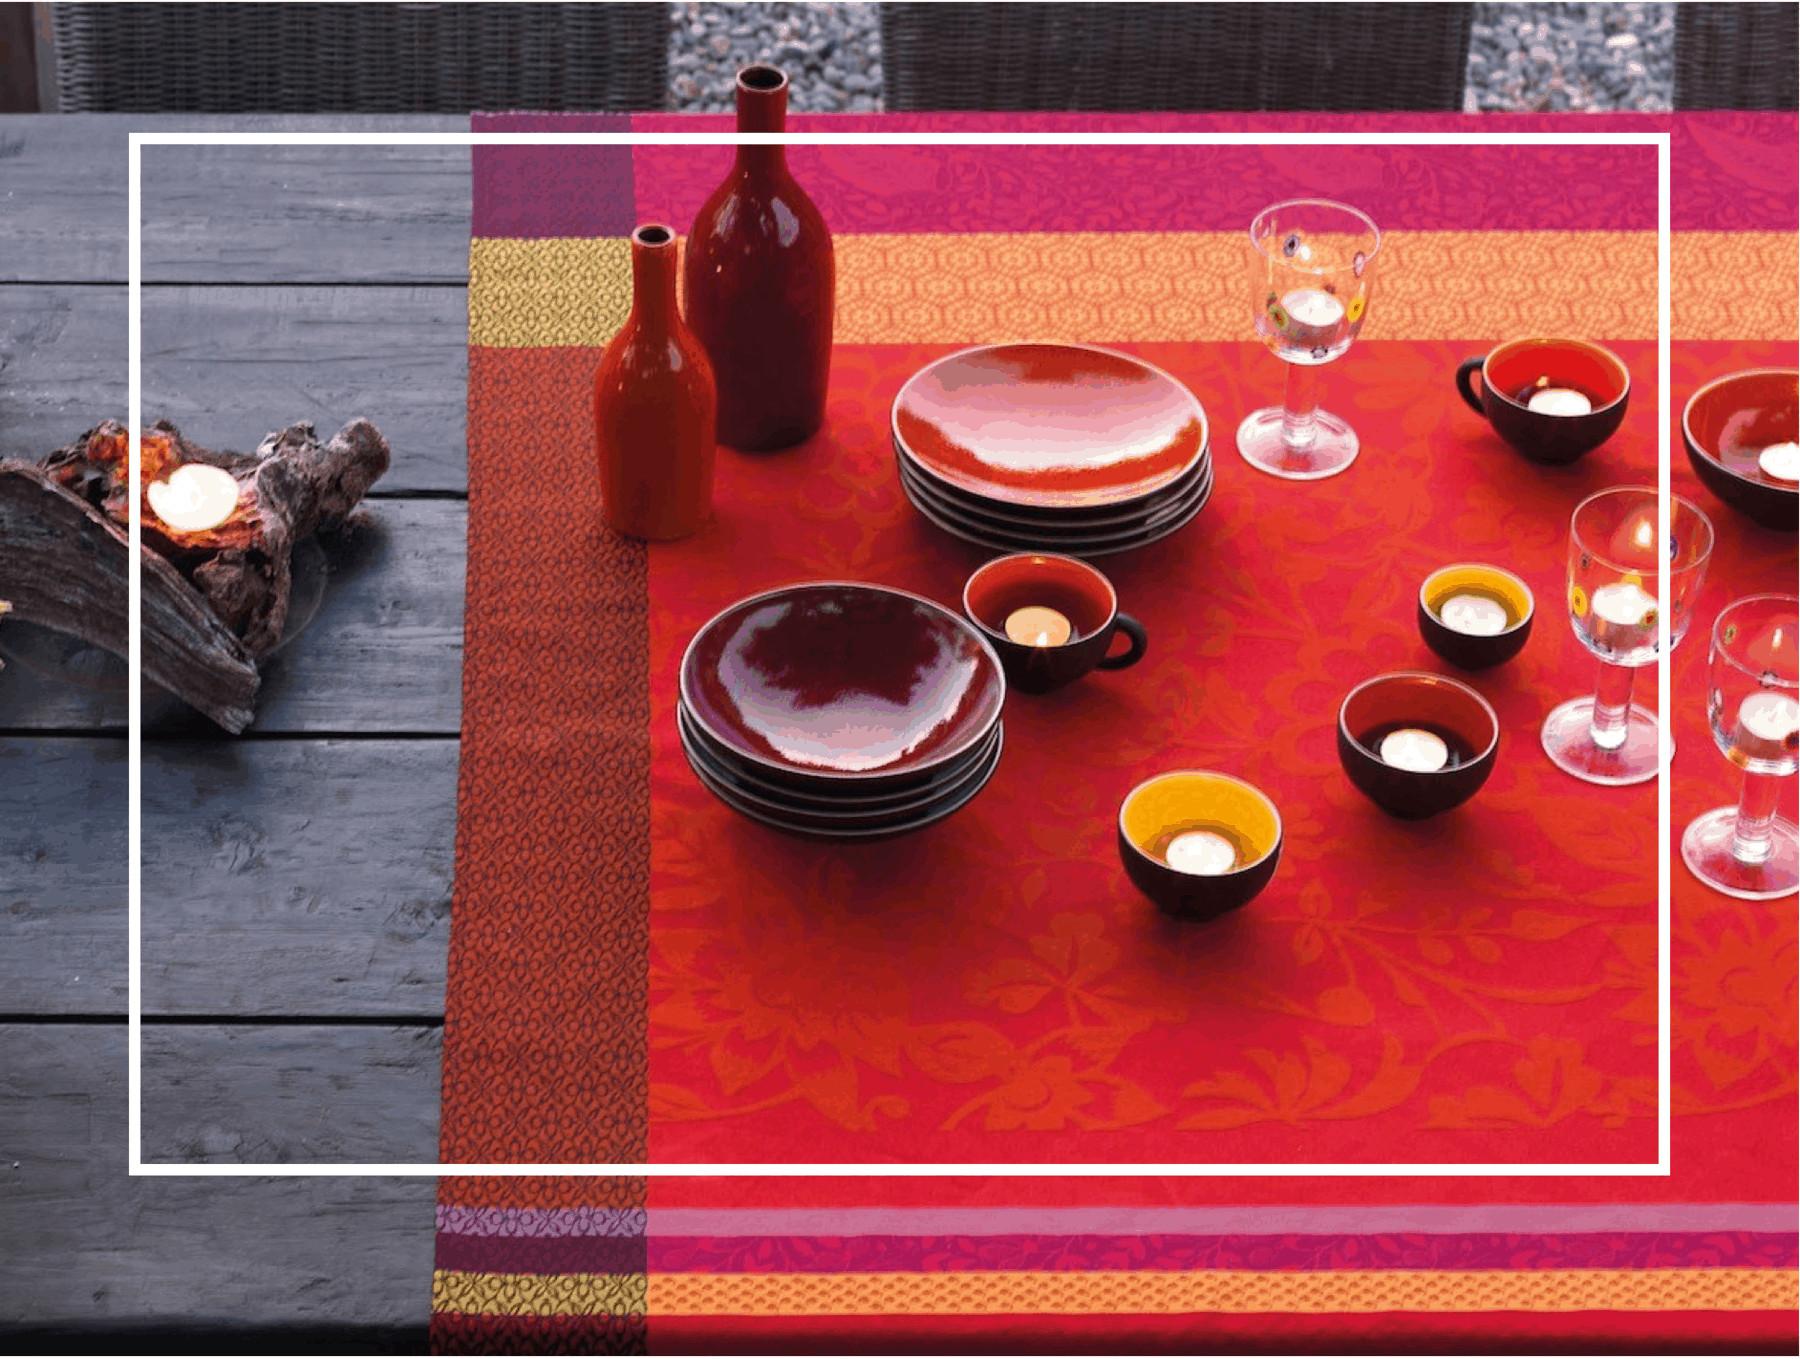 French Luxury Home Decor Le Jacquard Francais OuiPlease OuiBlog